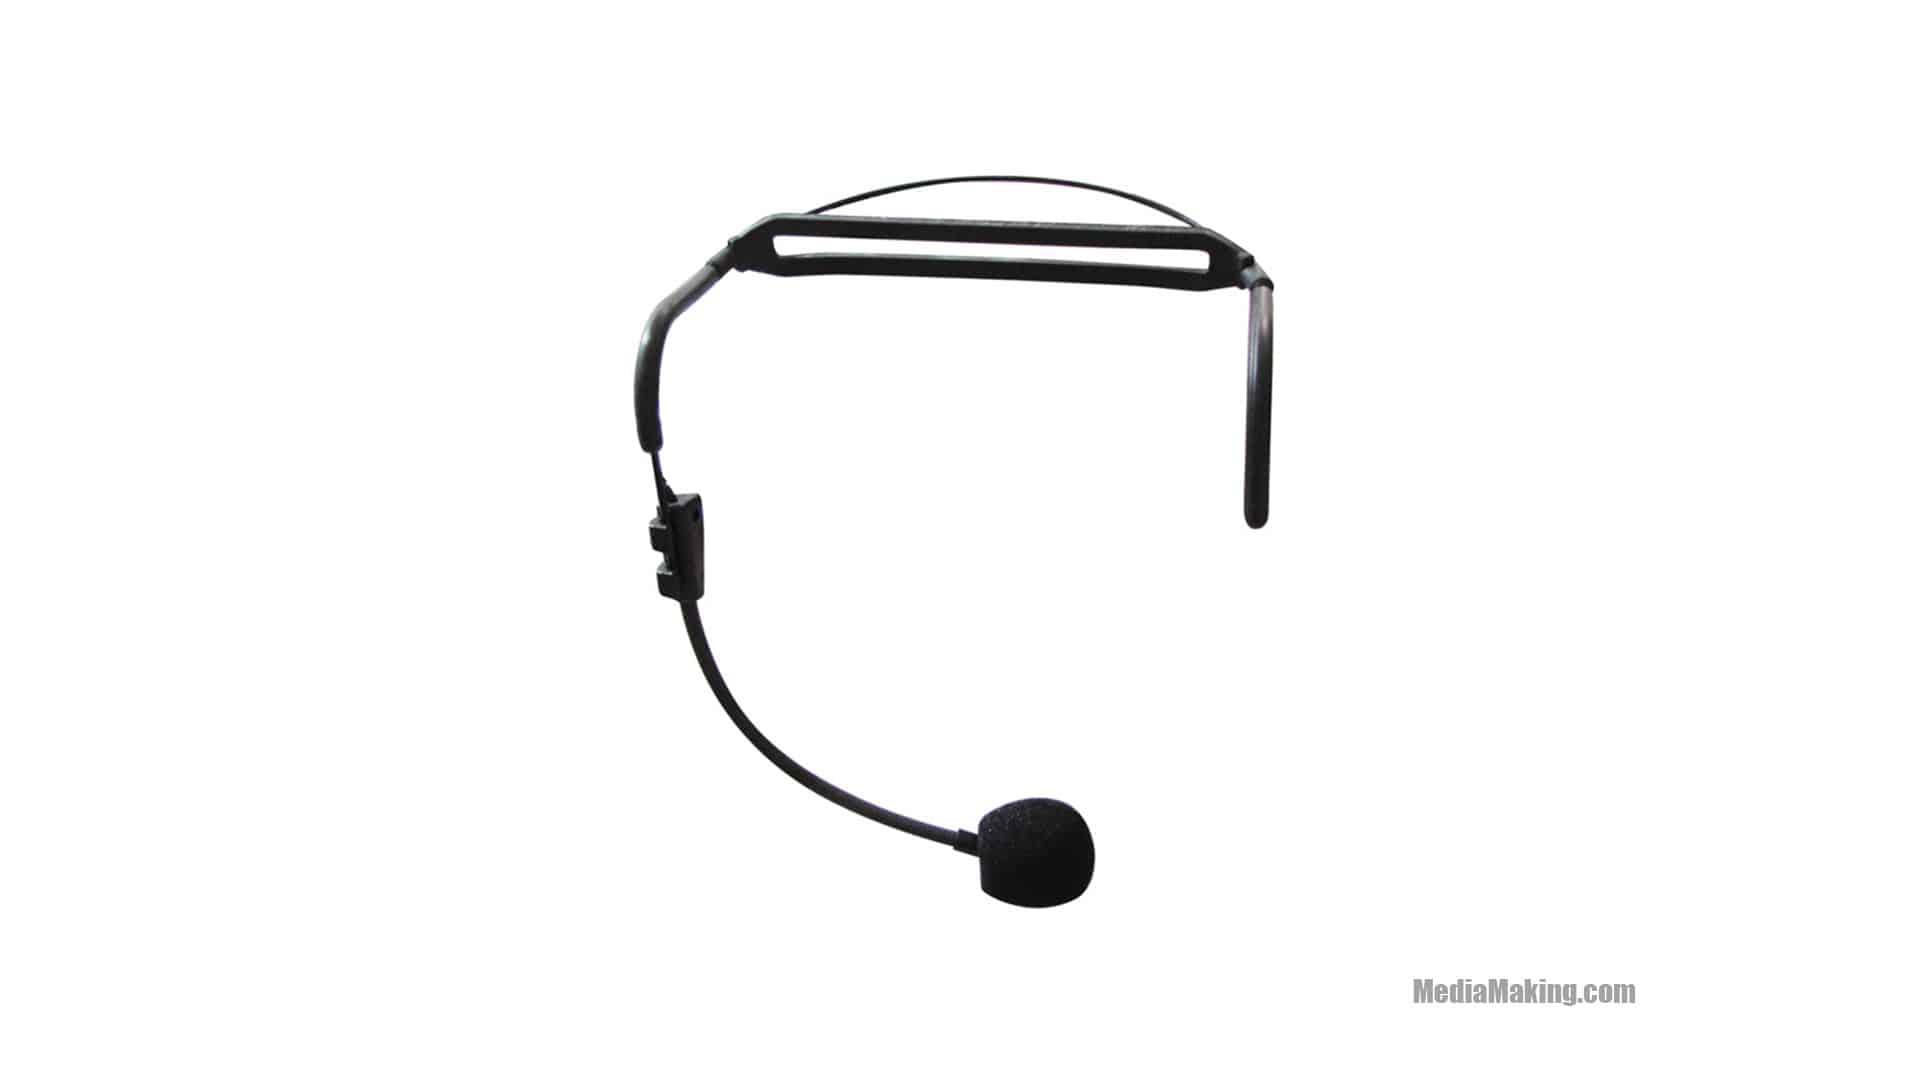 noleggio radiomicrofoni, Microphones and radio microphones, MediaMaking